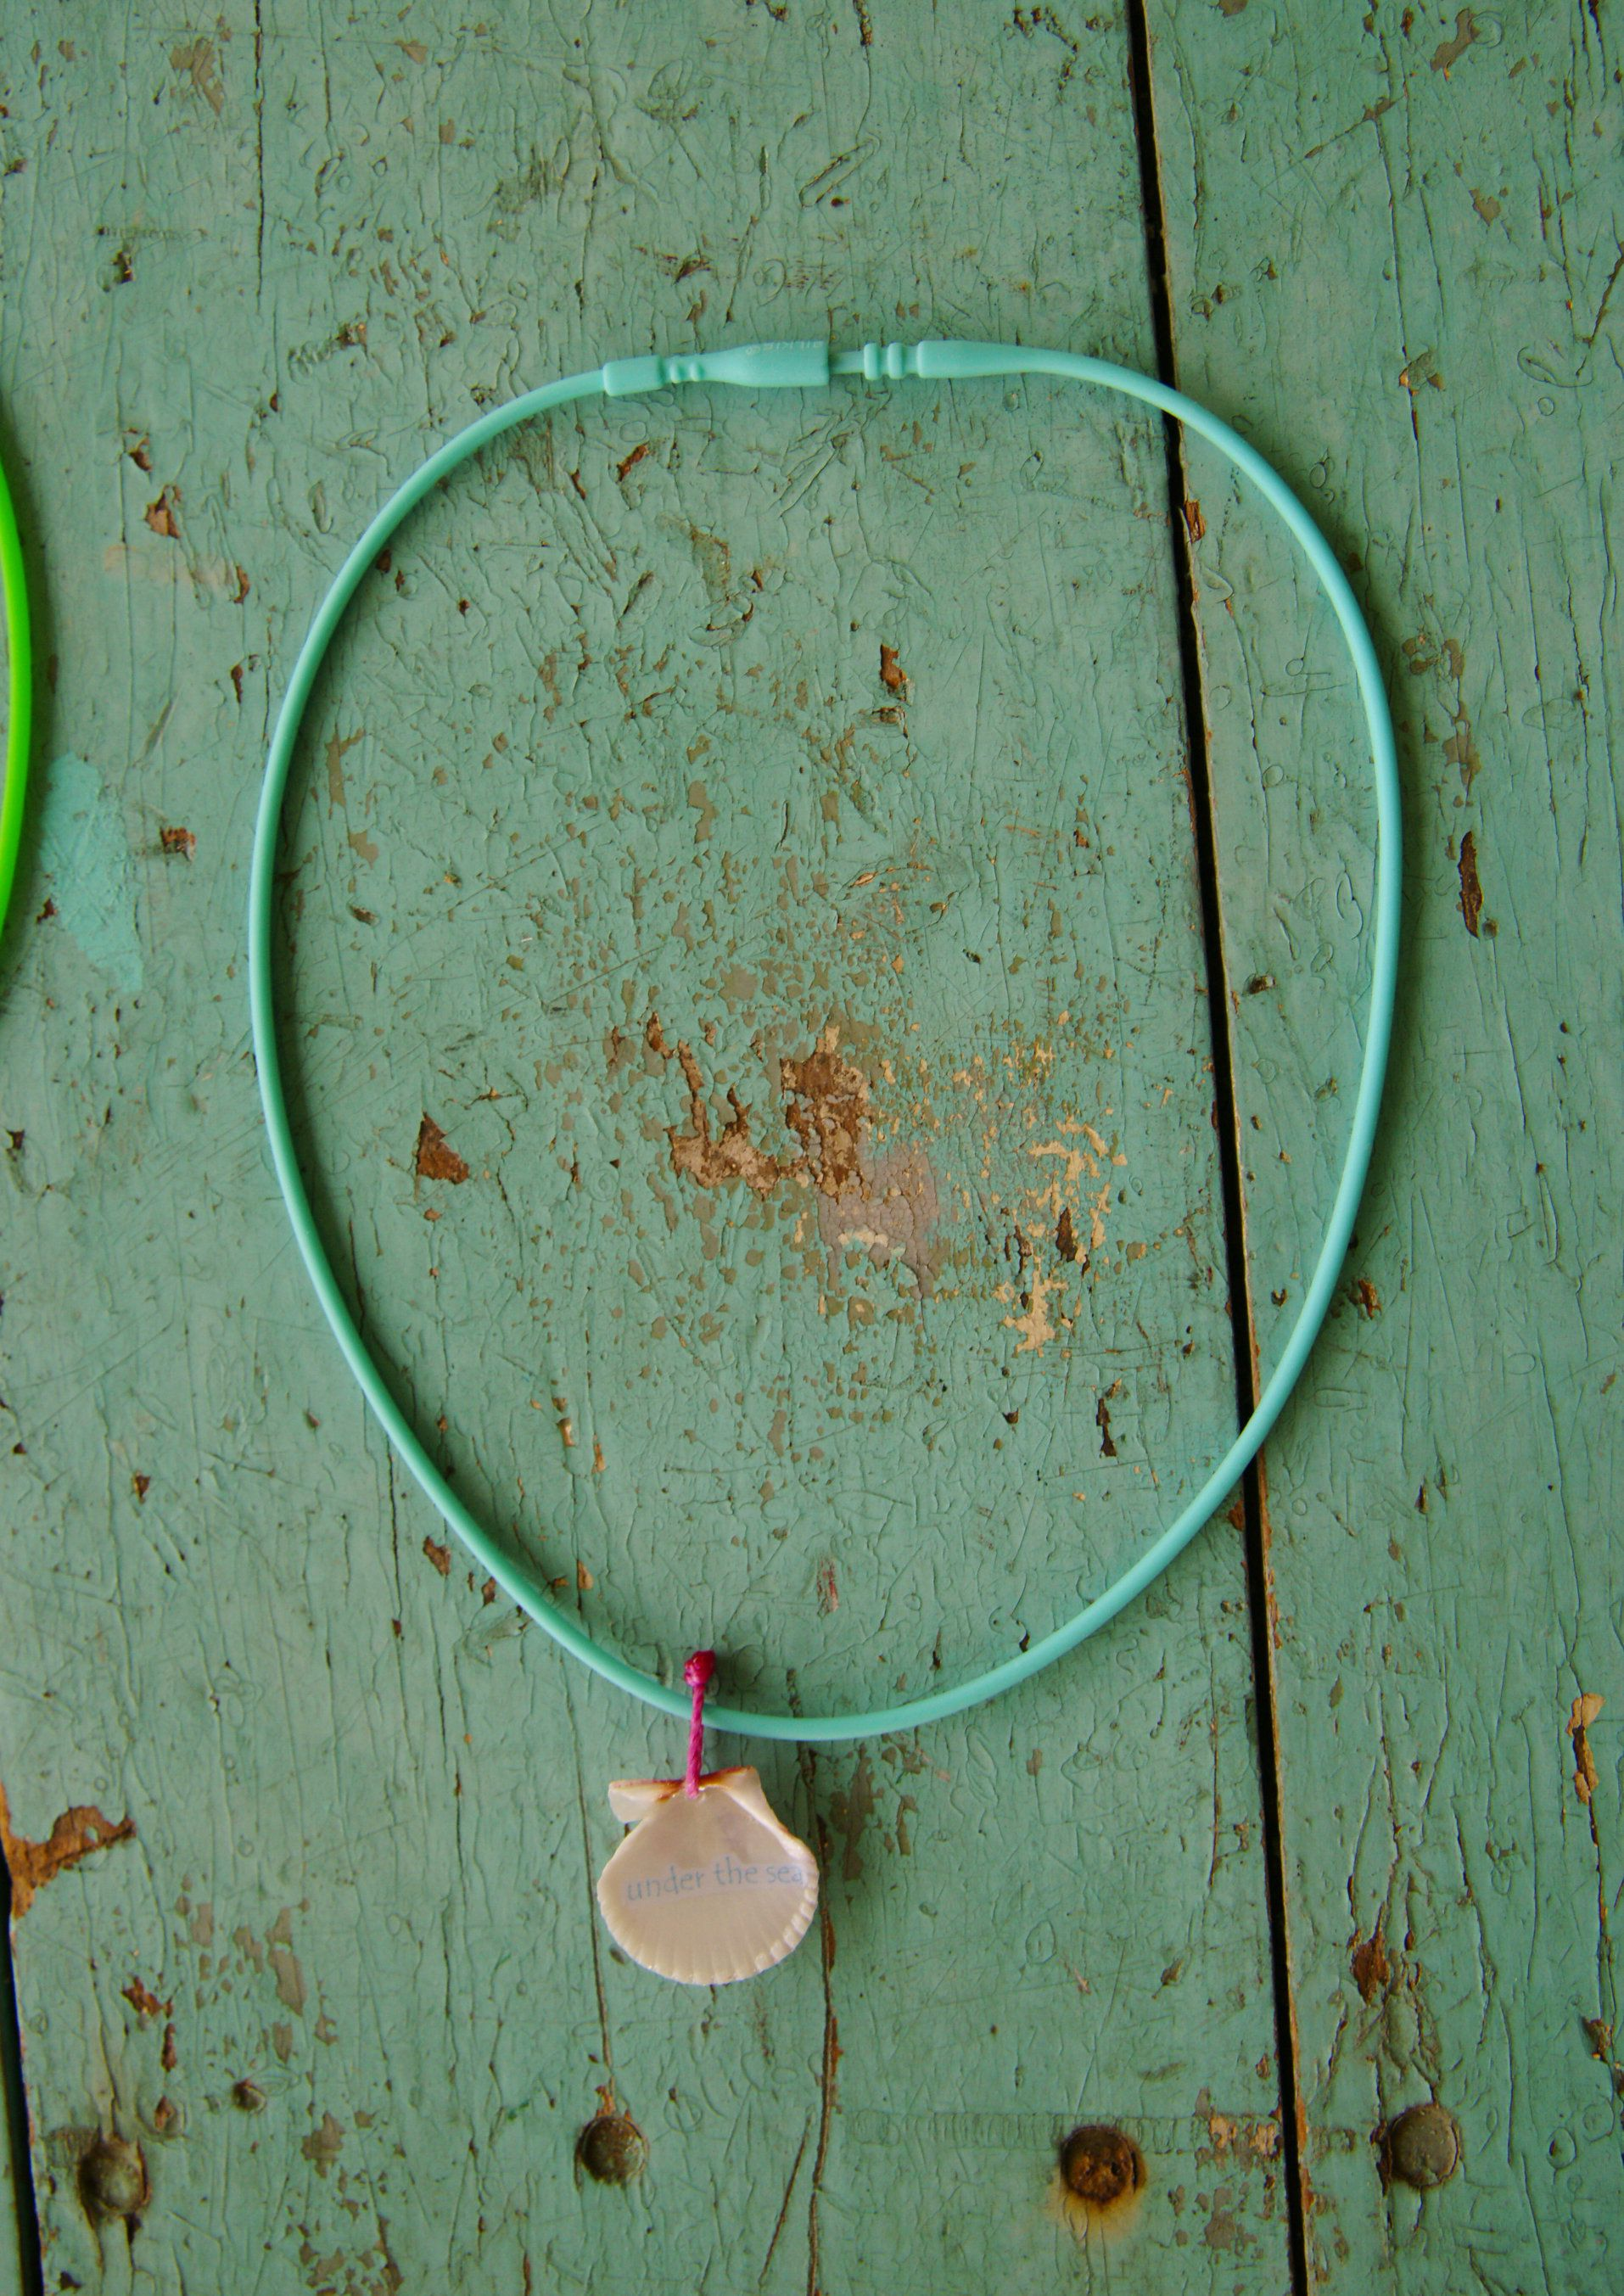 Little Mermaid with Fish Donsina Shell Necklace ~ Little girl beach island ocean jewelry beach waterproof surf style